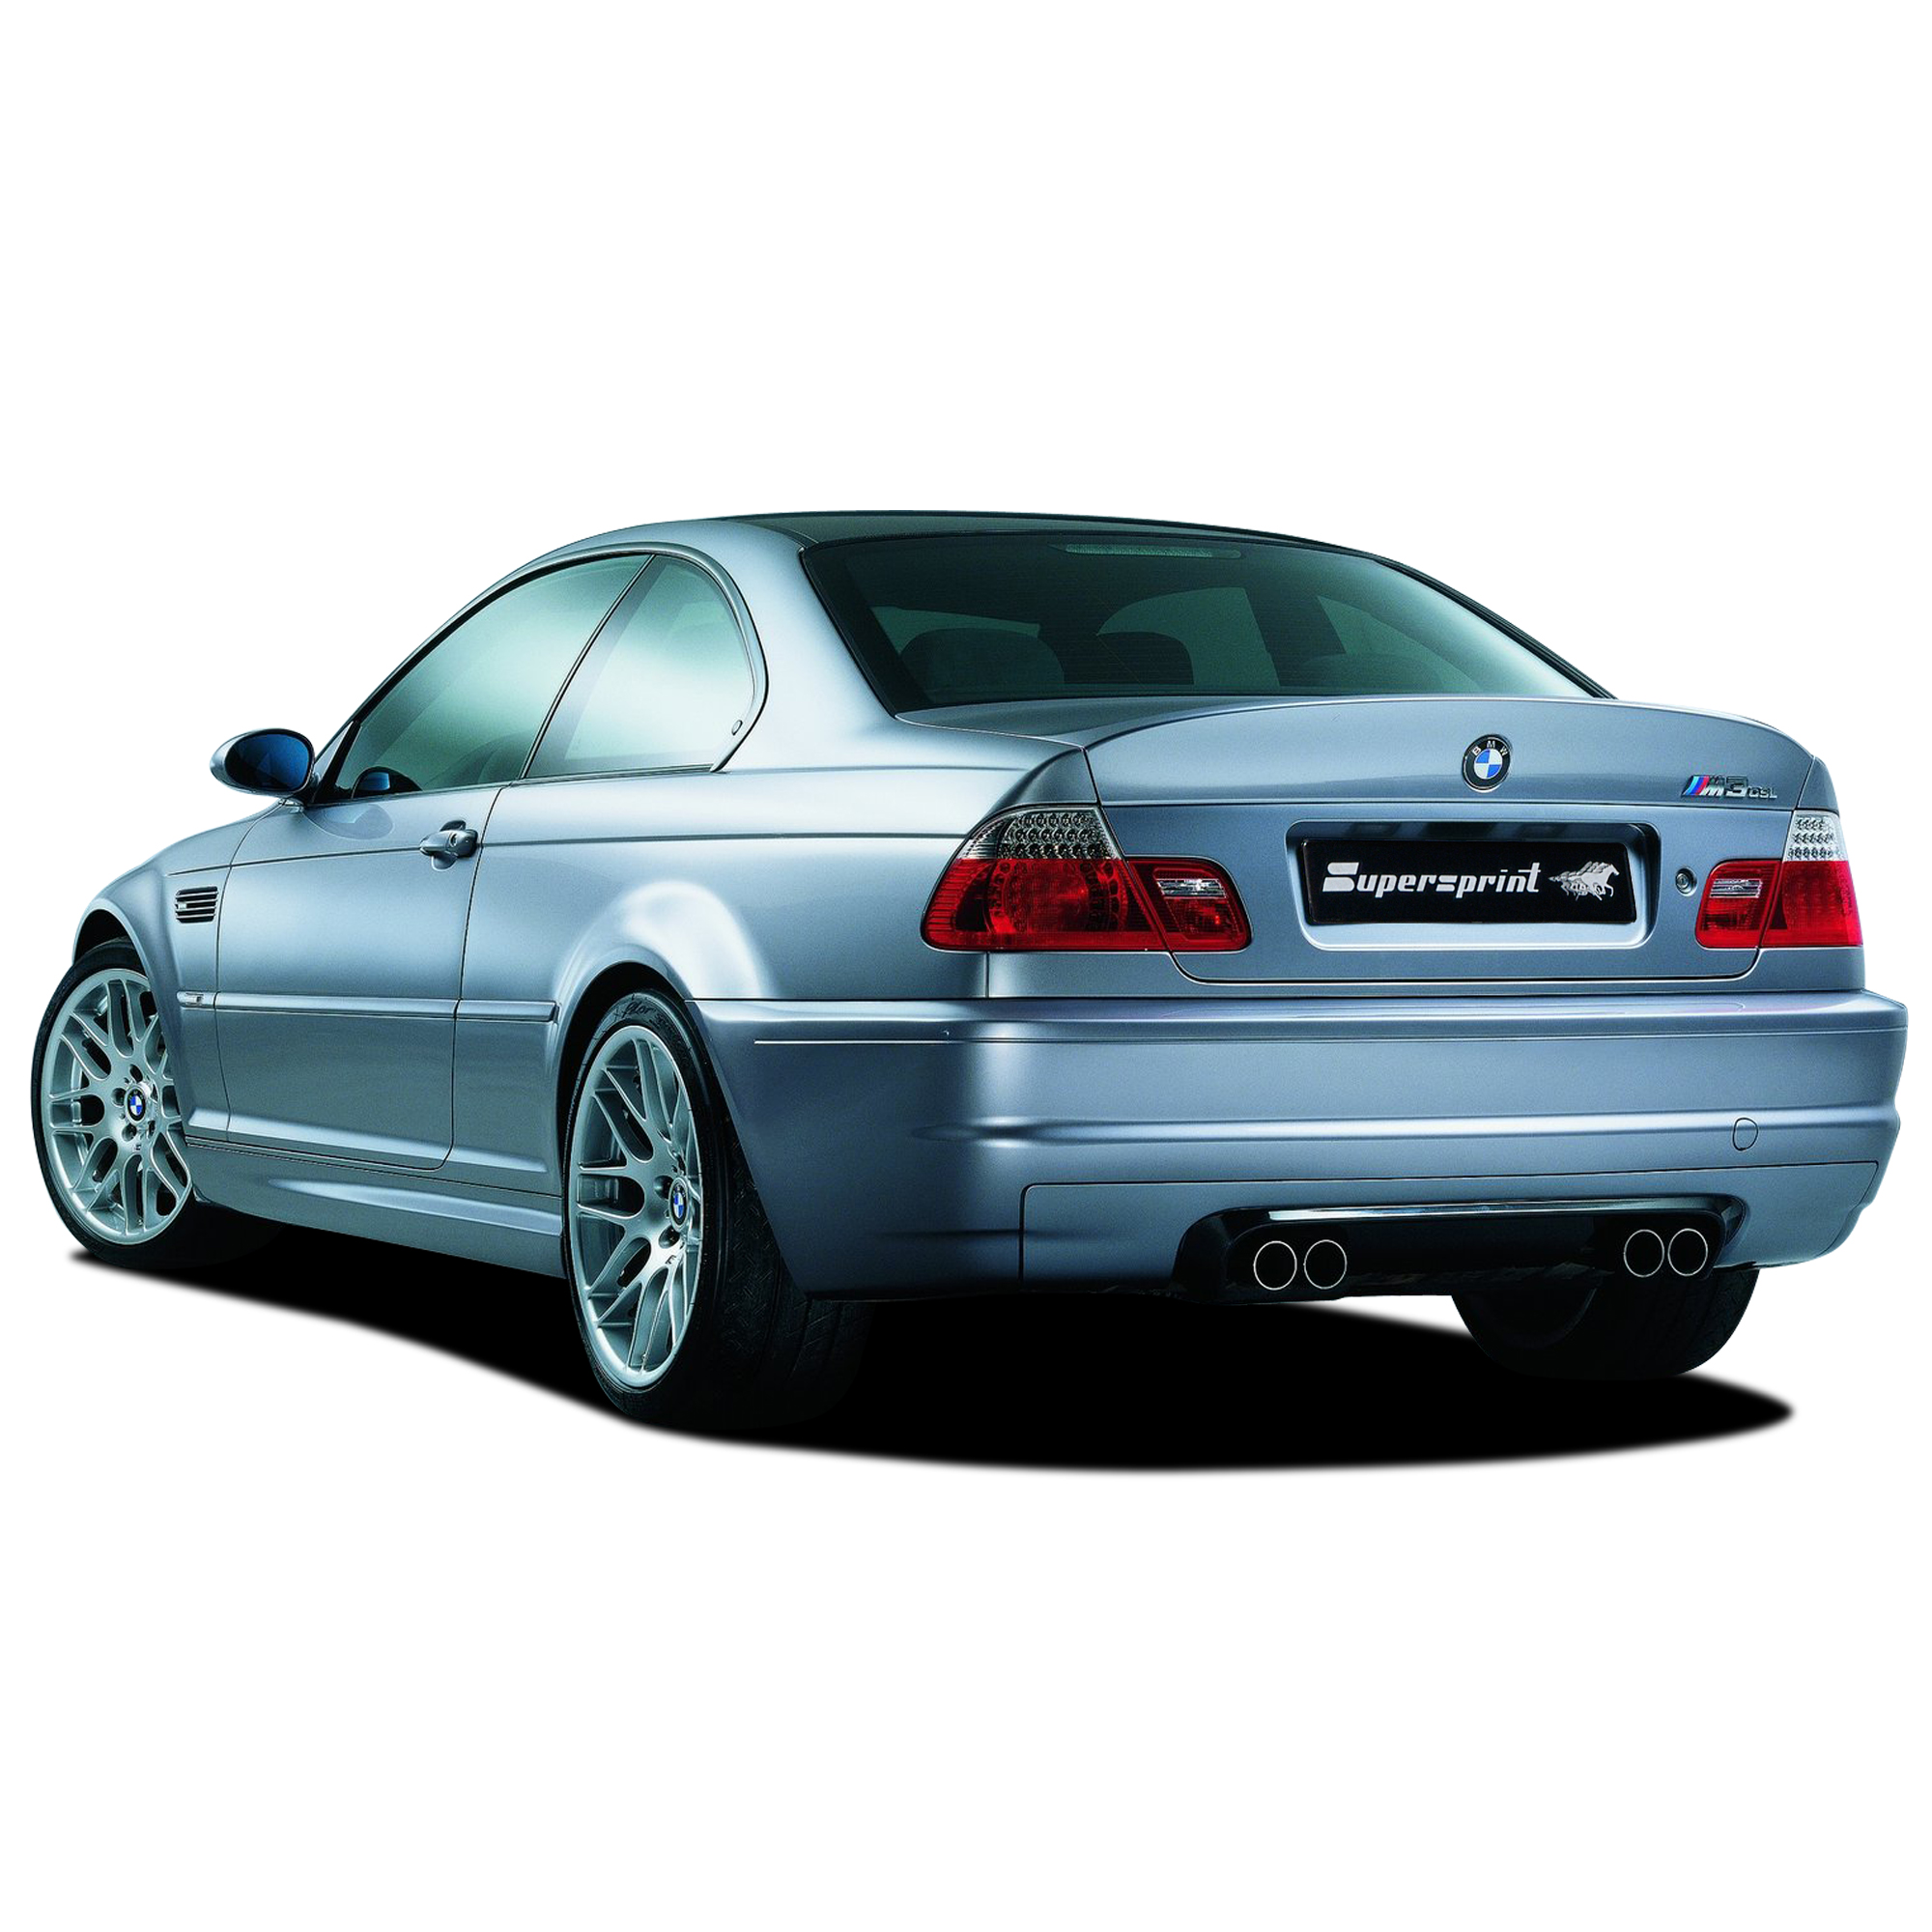 Performance Sport Exhaust For BMW E46 M3 CSL Ø60mm, BMW